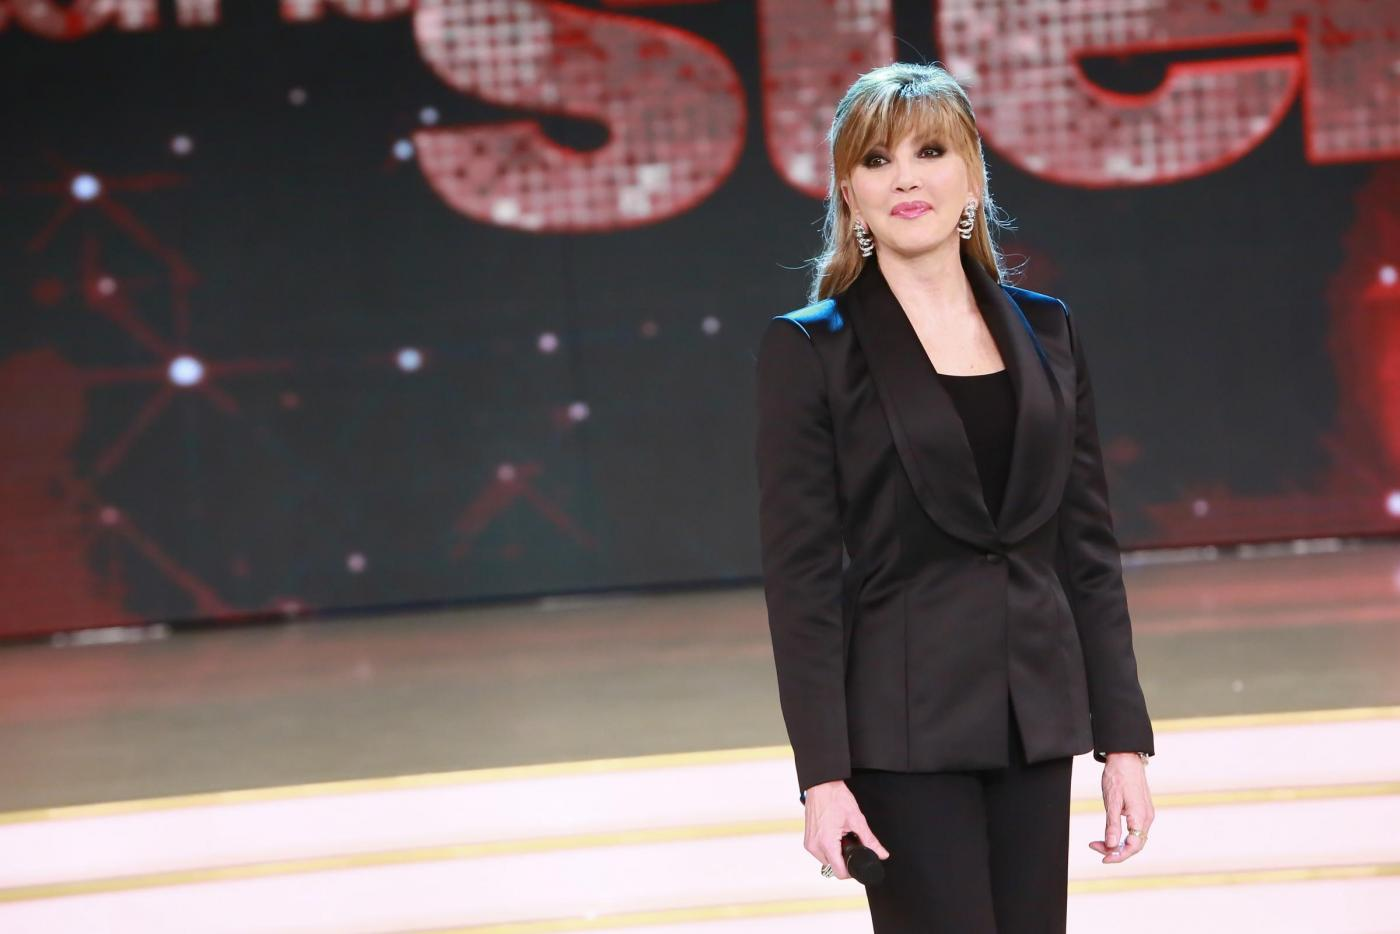 Milly Carlucci Simona Ventura